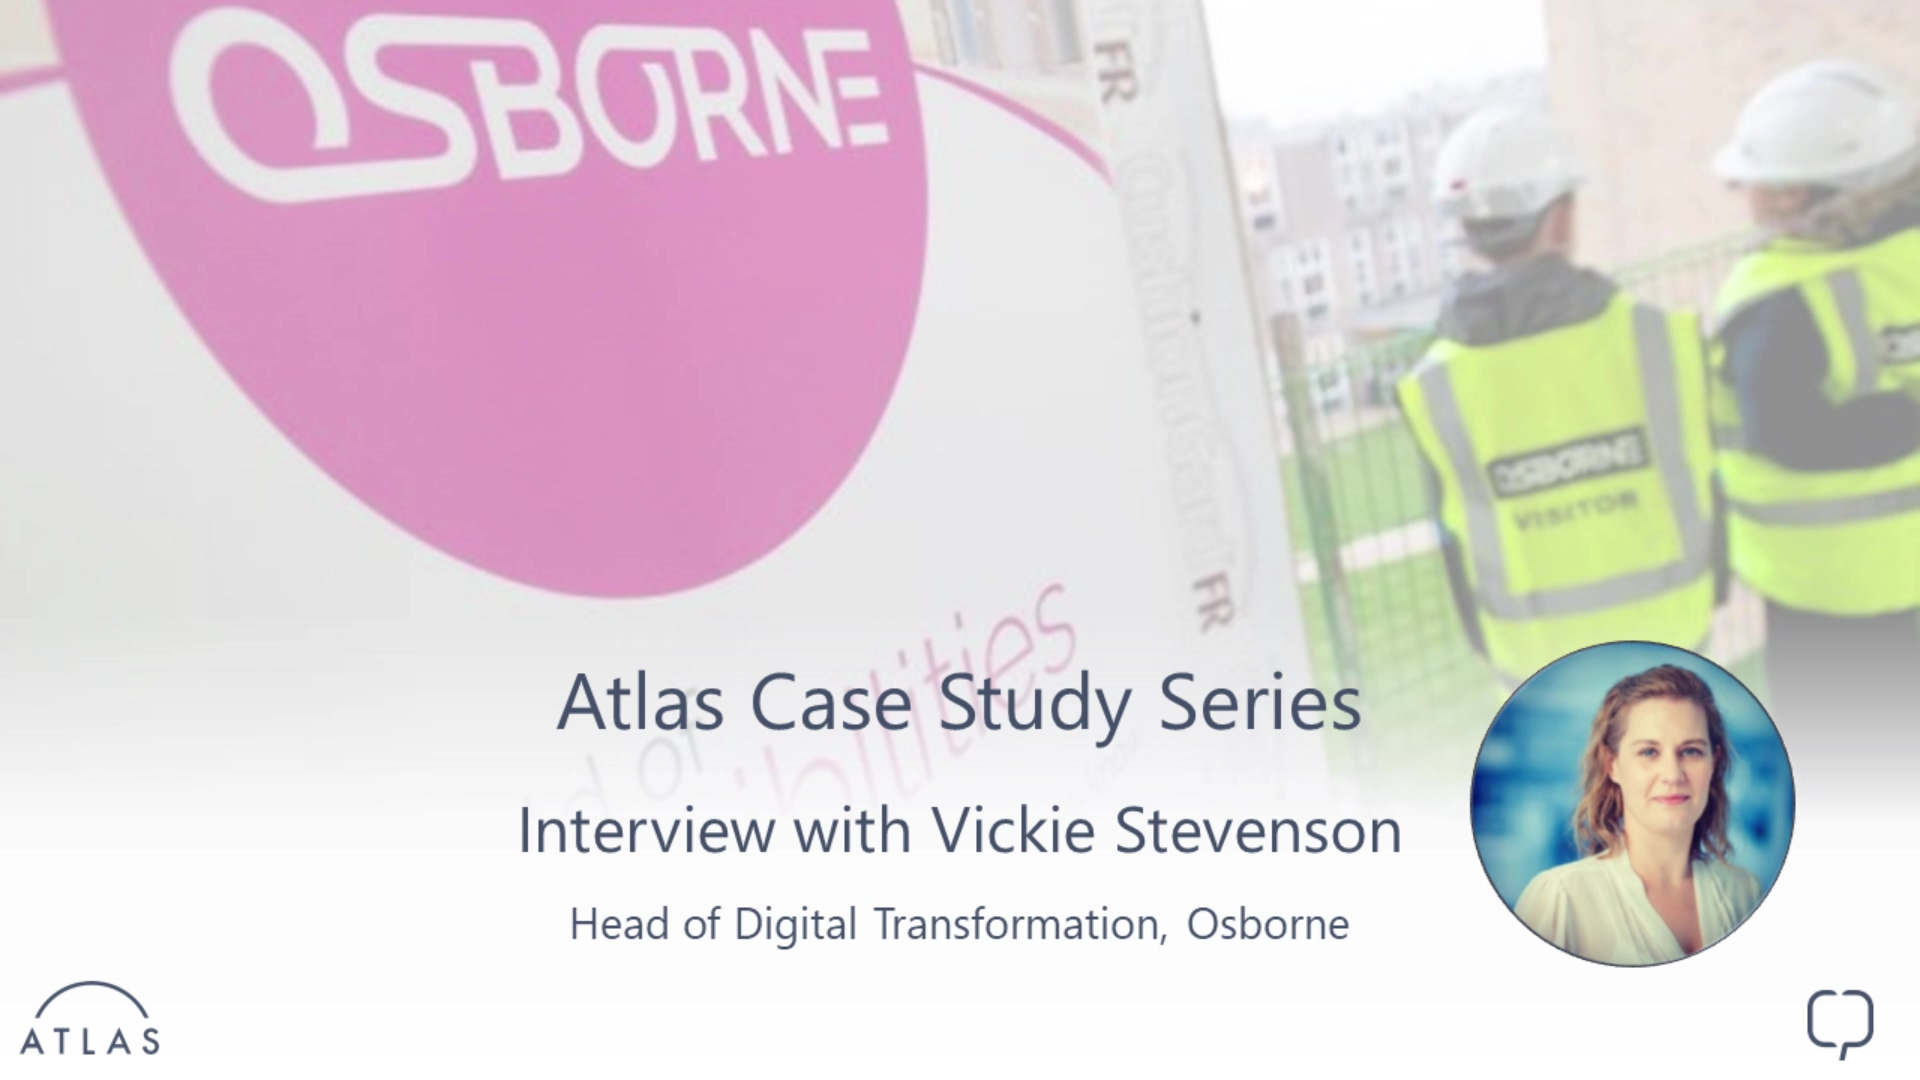 Osborne Case Study - 001 - Atlas focus-1